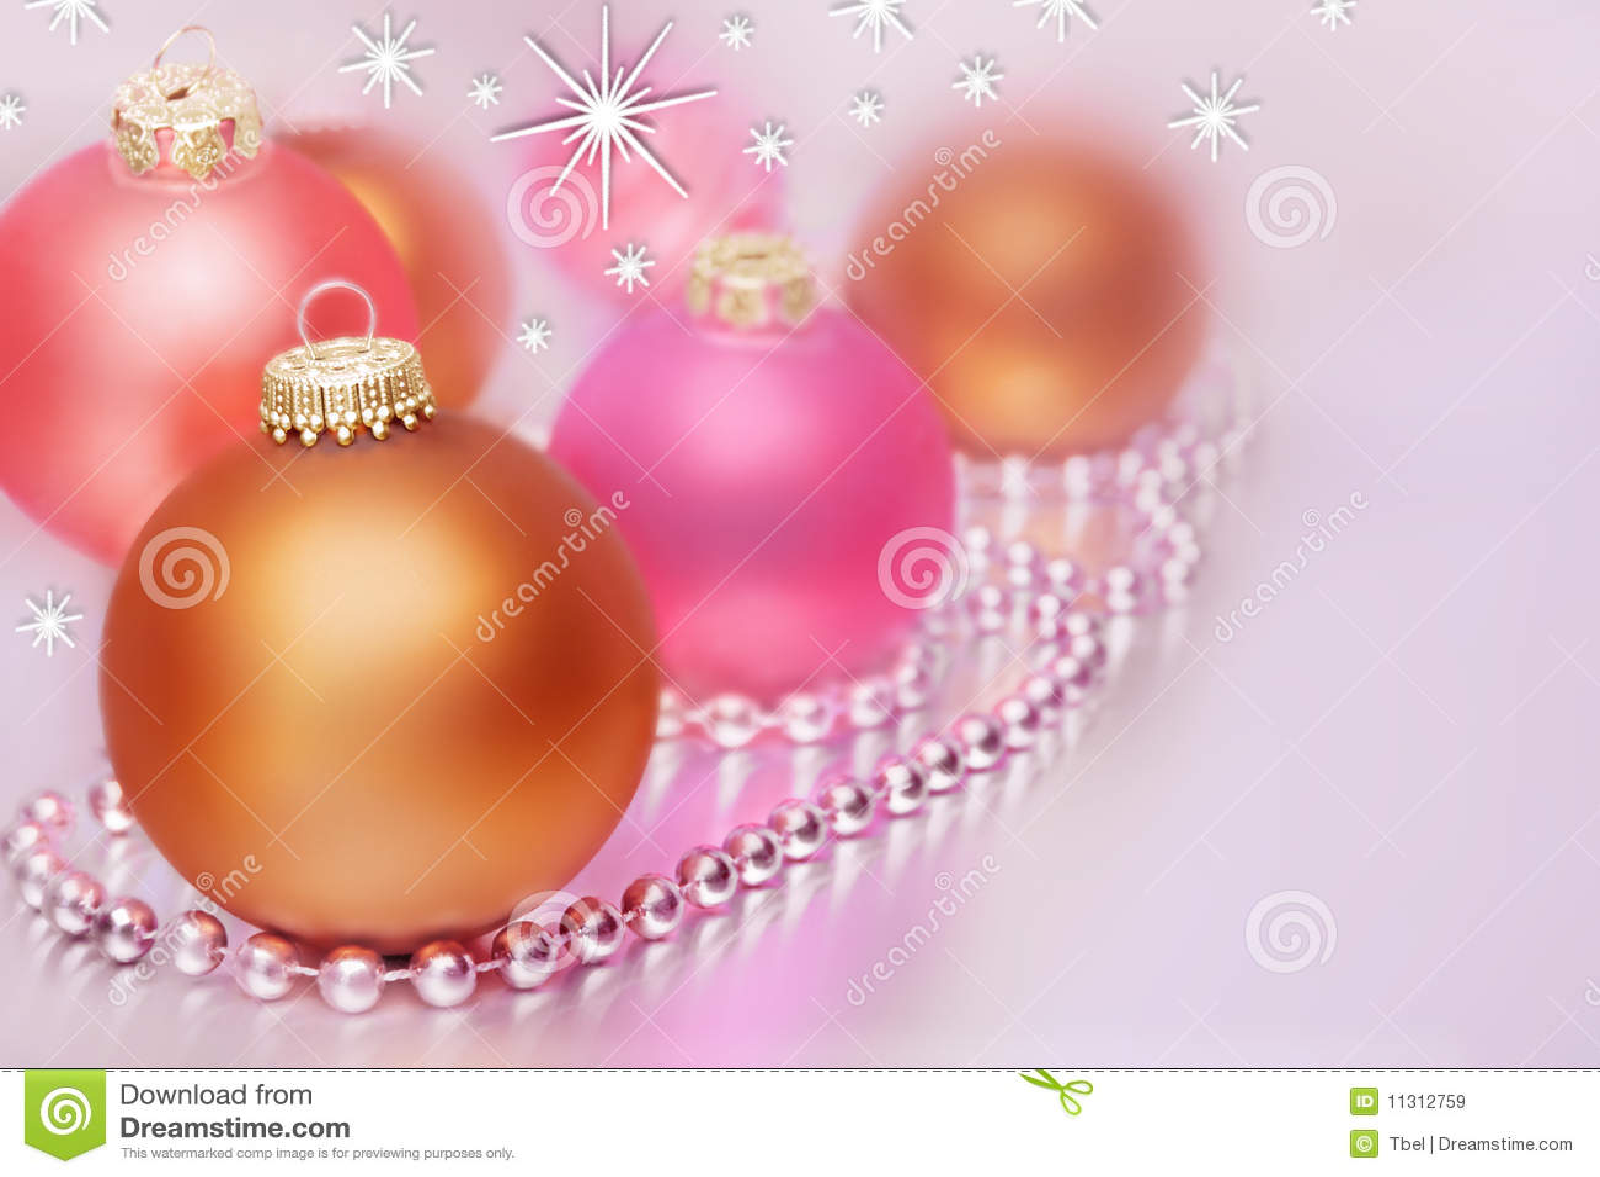 Pastellweihnachtskugeln